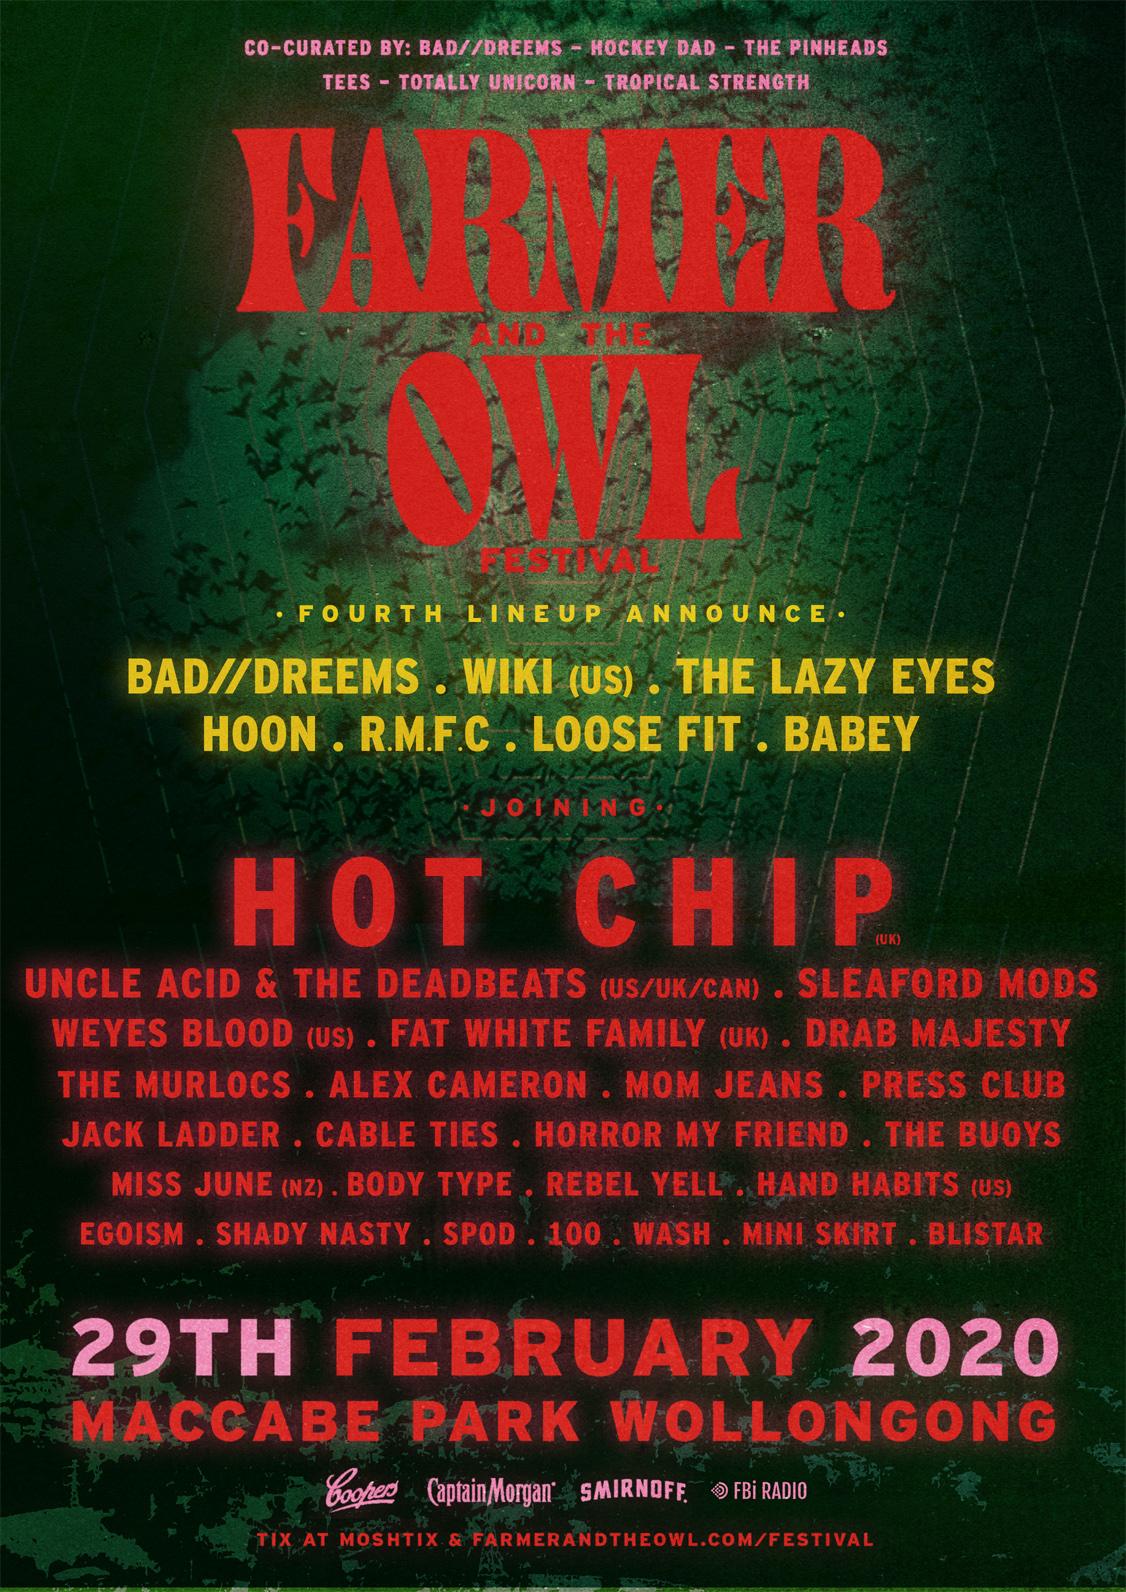 Farmer & The Owl Festival 2020 lineup poster